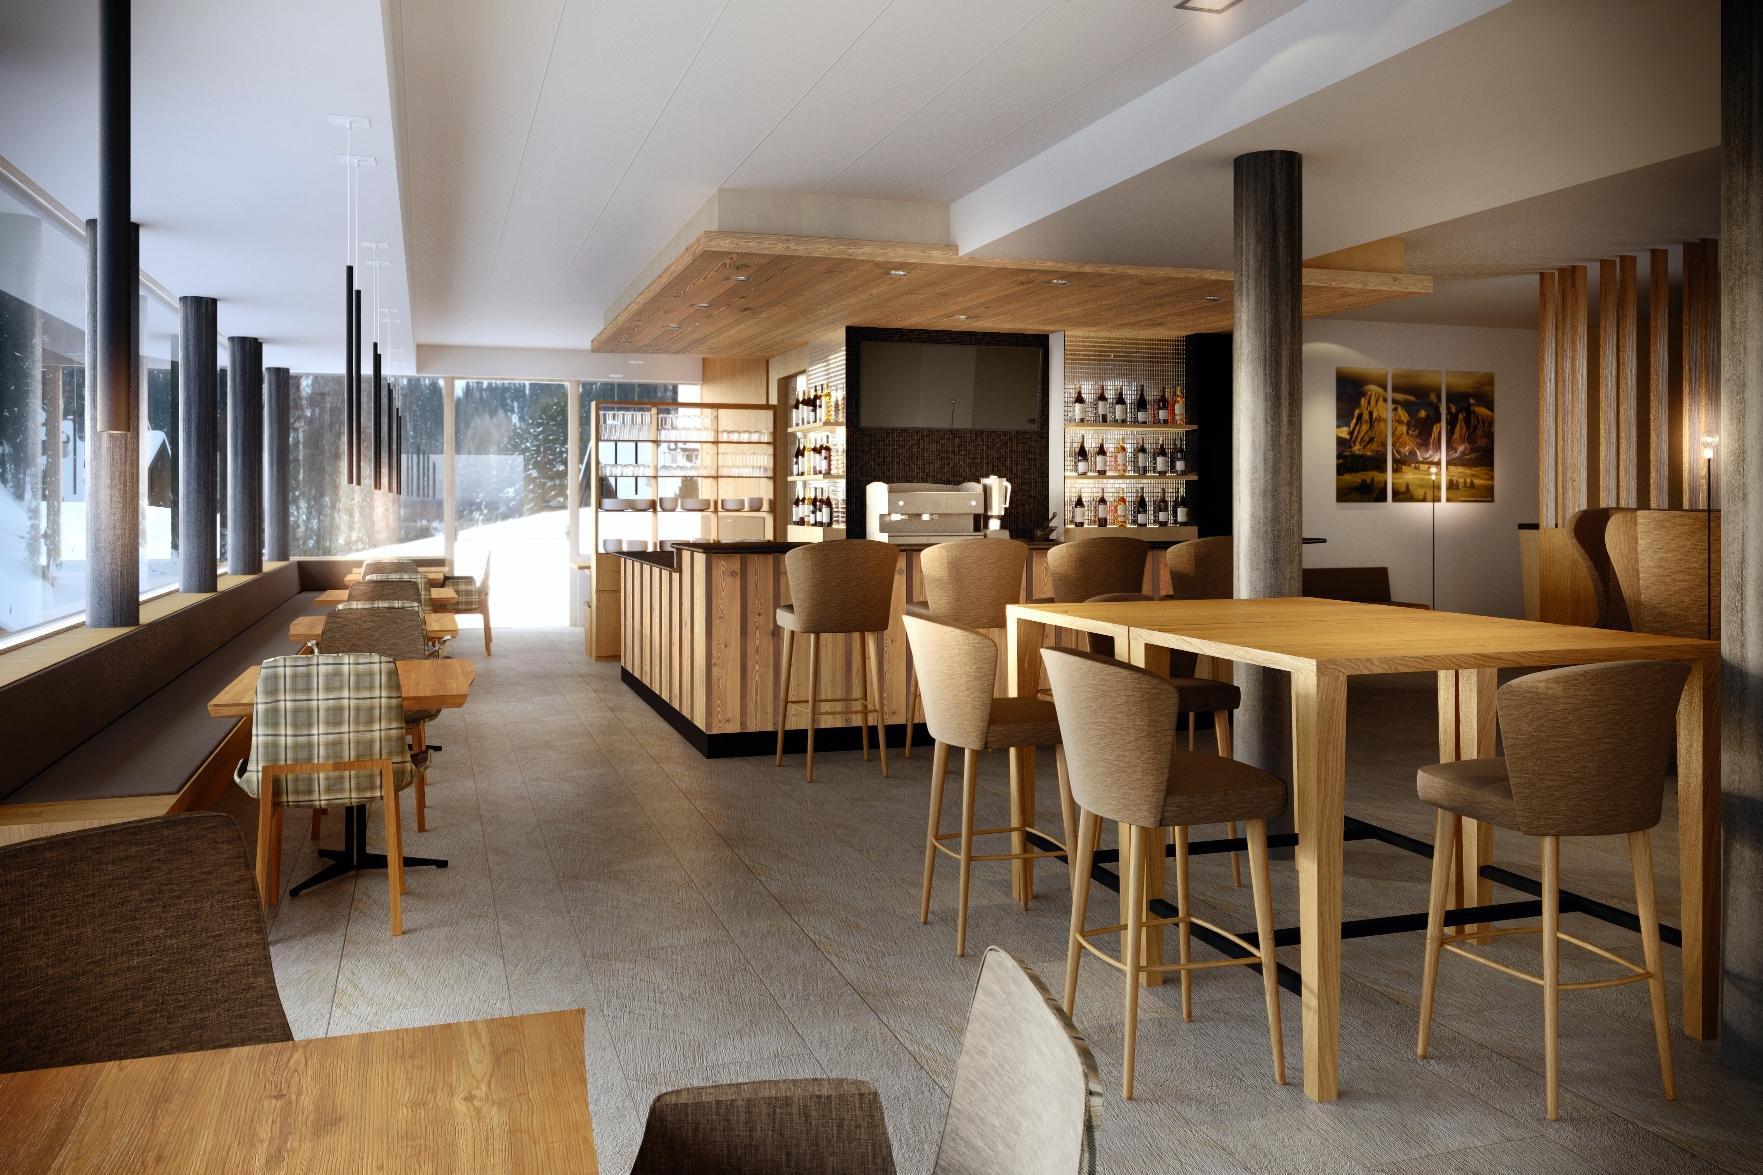 Eden selva mountain design hotel tourismusmanagement for Design hotel alto adige